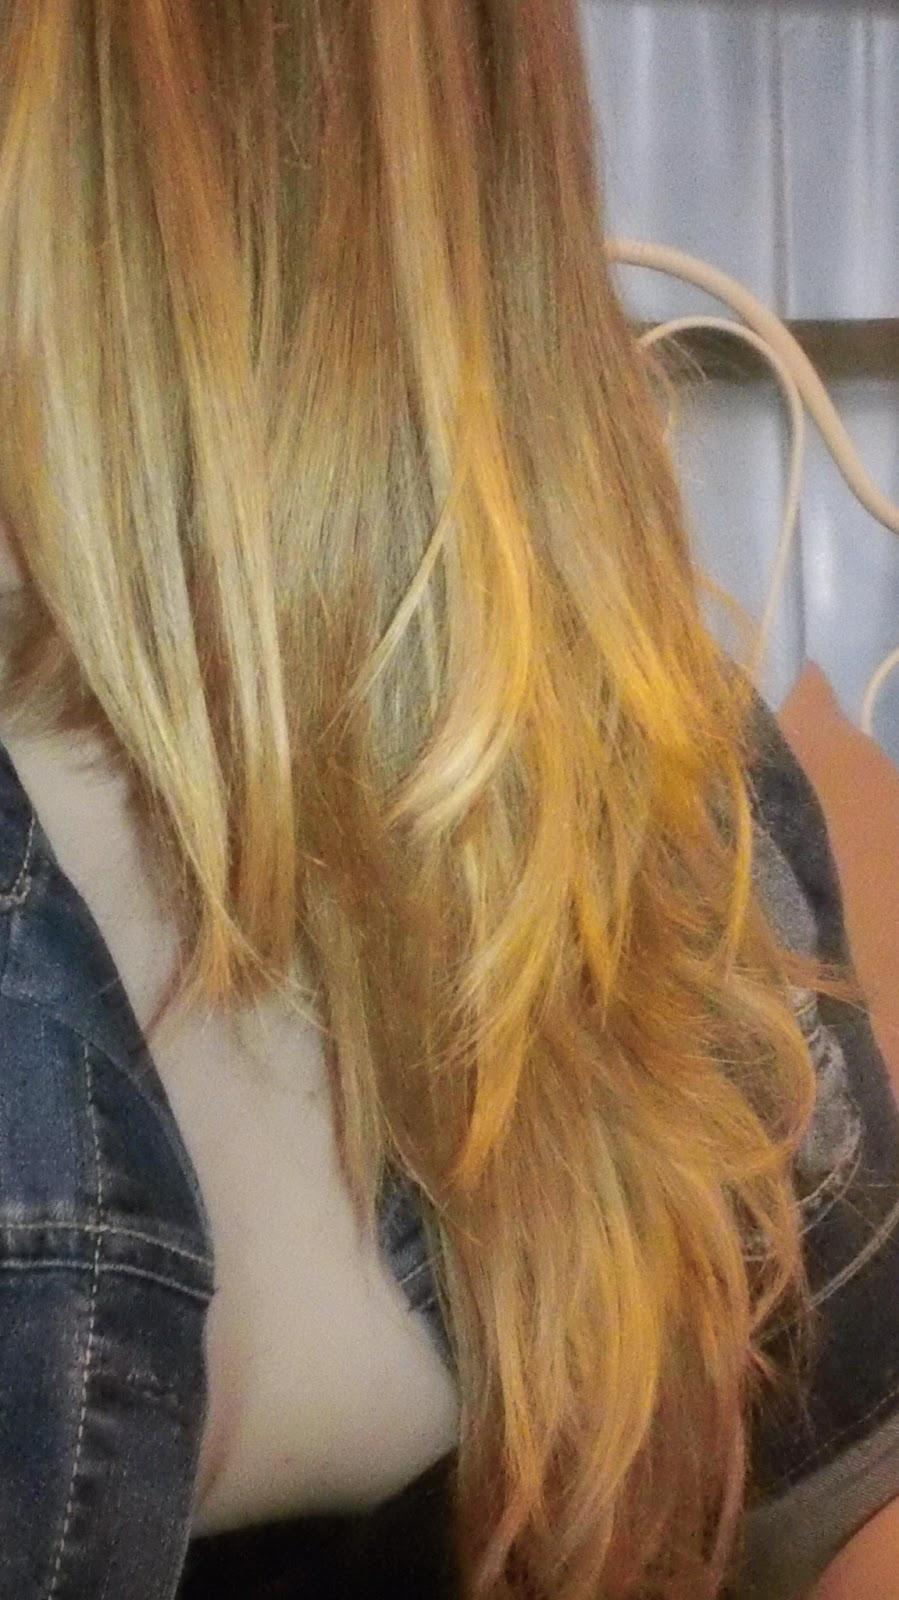 loreal paris feria ombre hair color review blonde. Black Bedroom Furniture Sets. Home Design Ideas